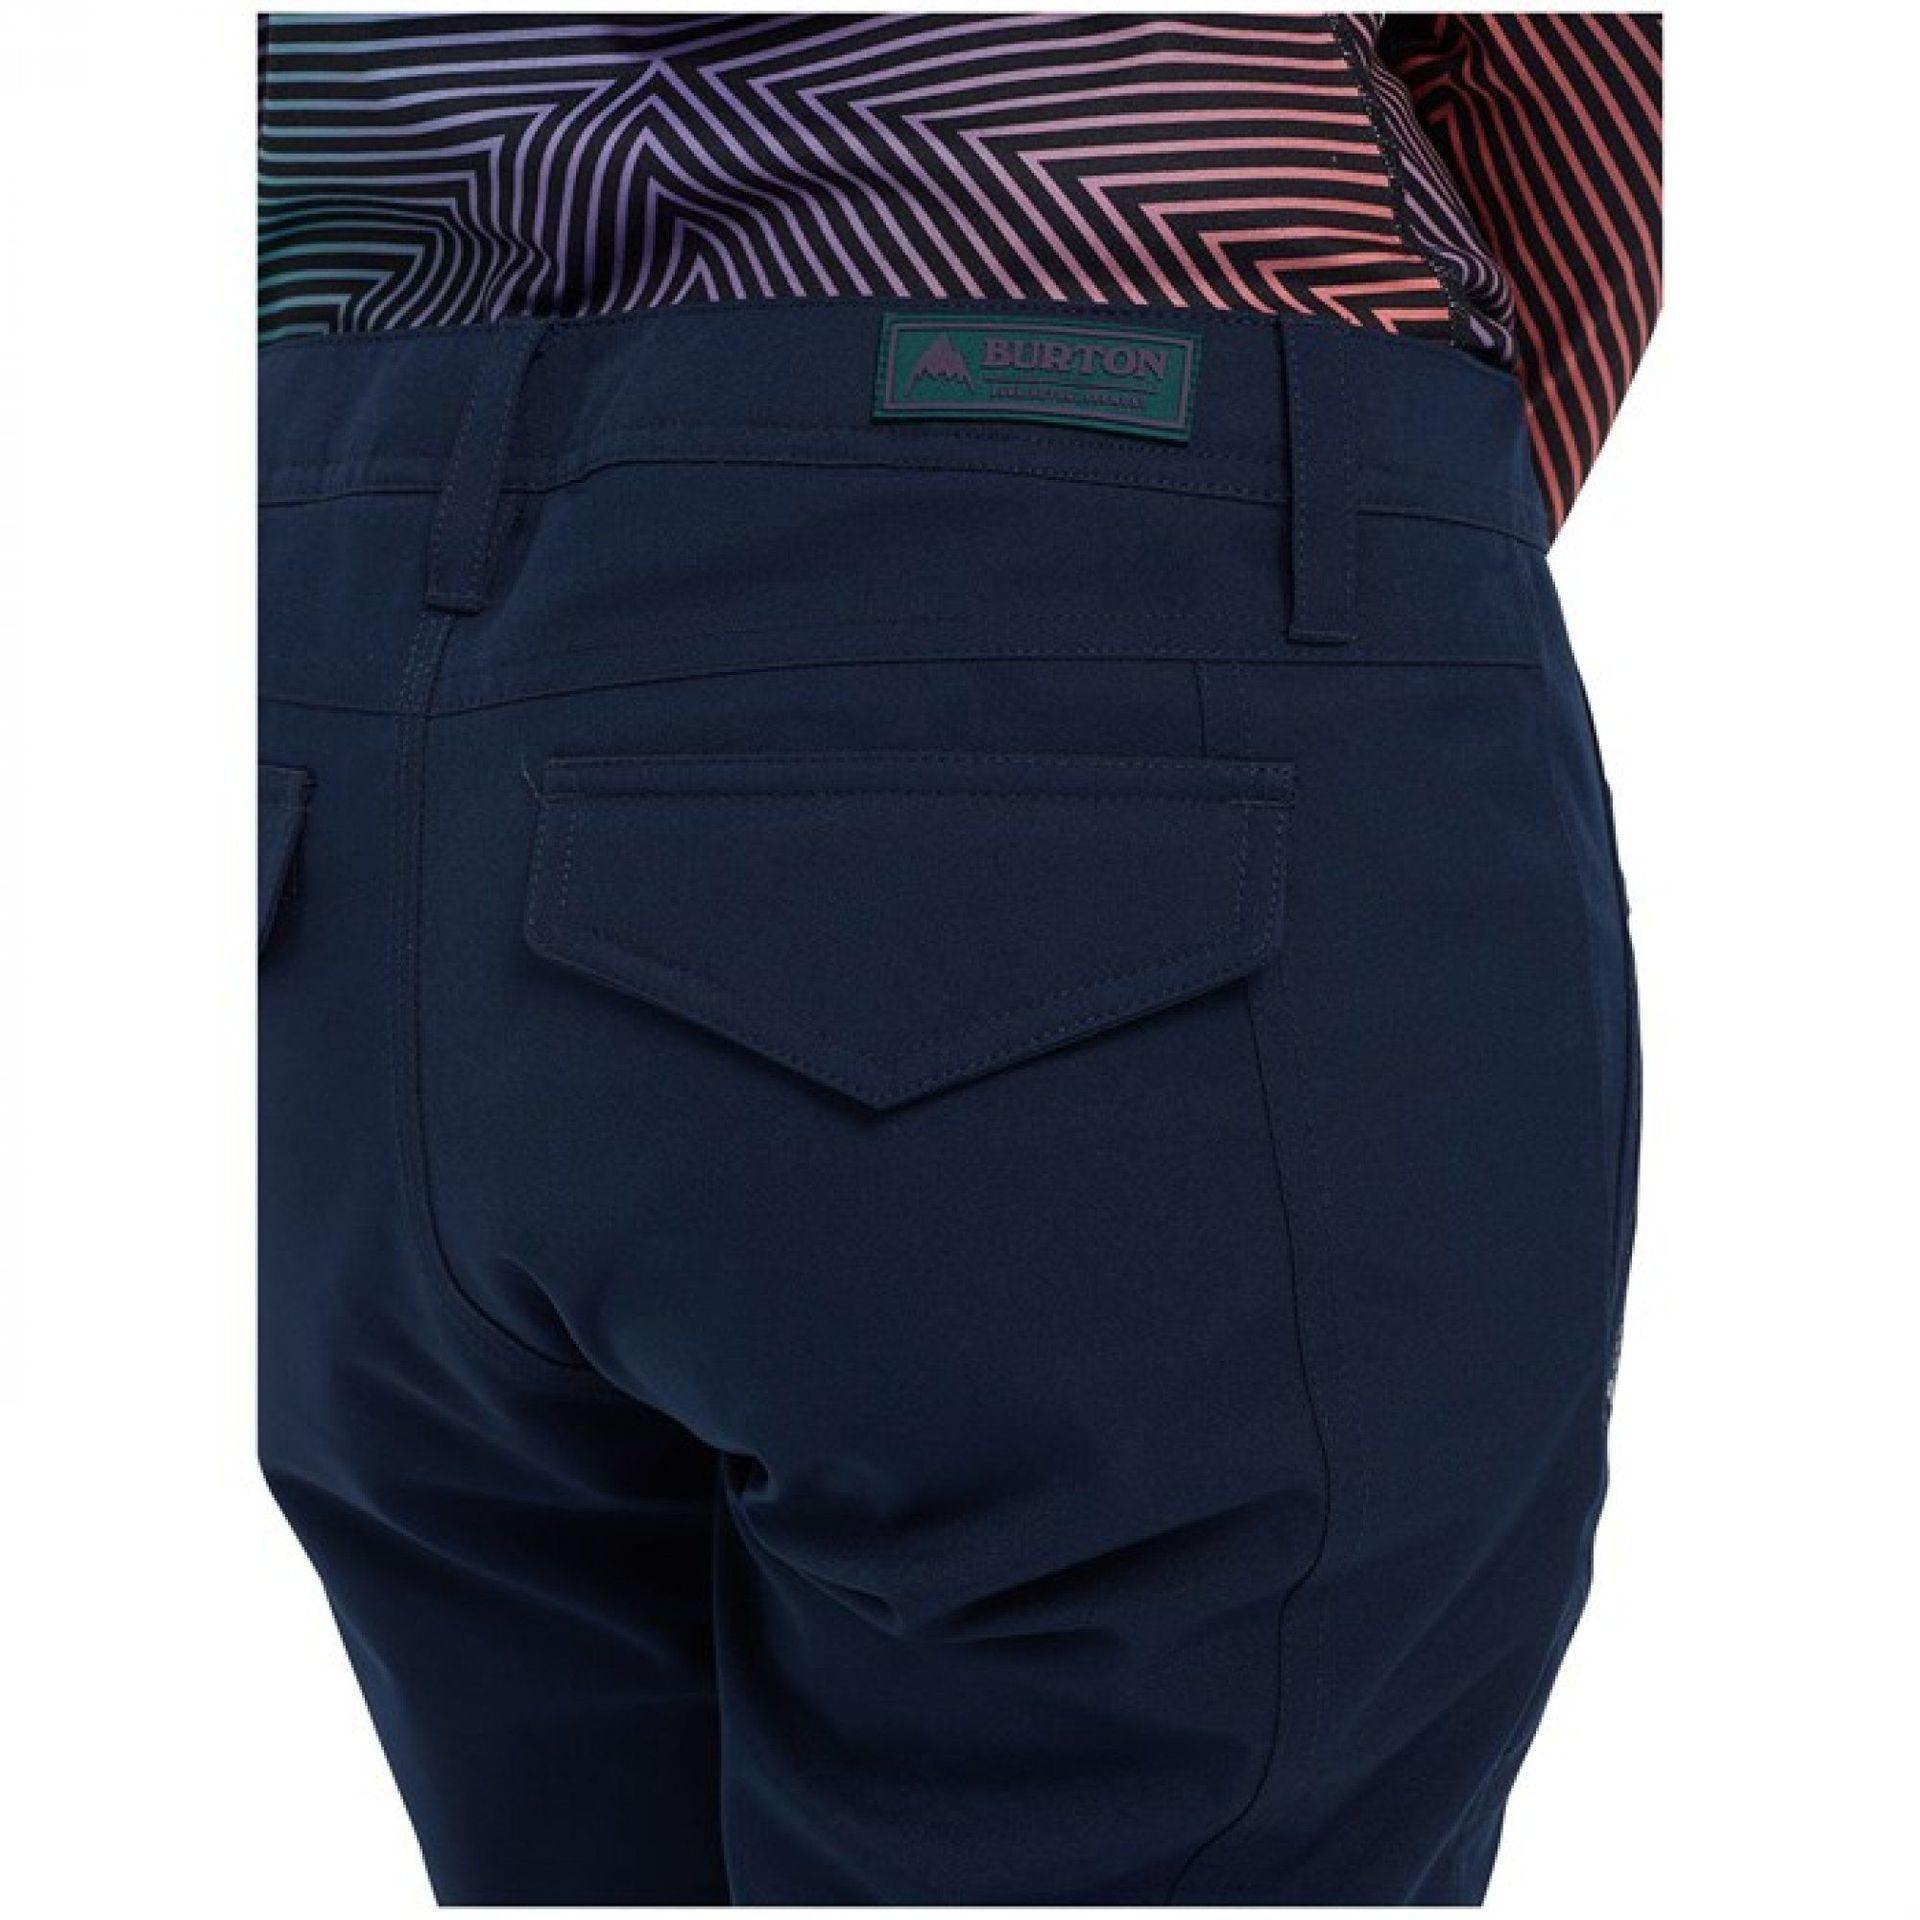 SPODNIE BURTON VIDA DRESS BLUE 150061 400 3